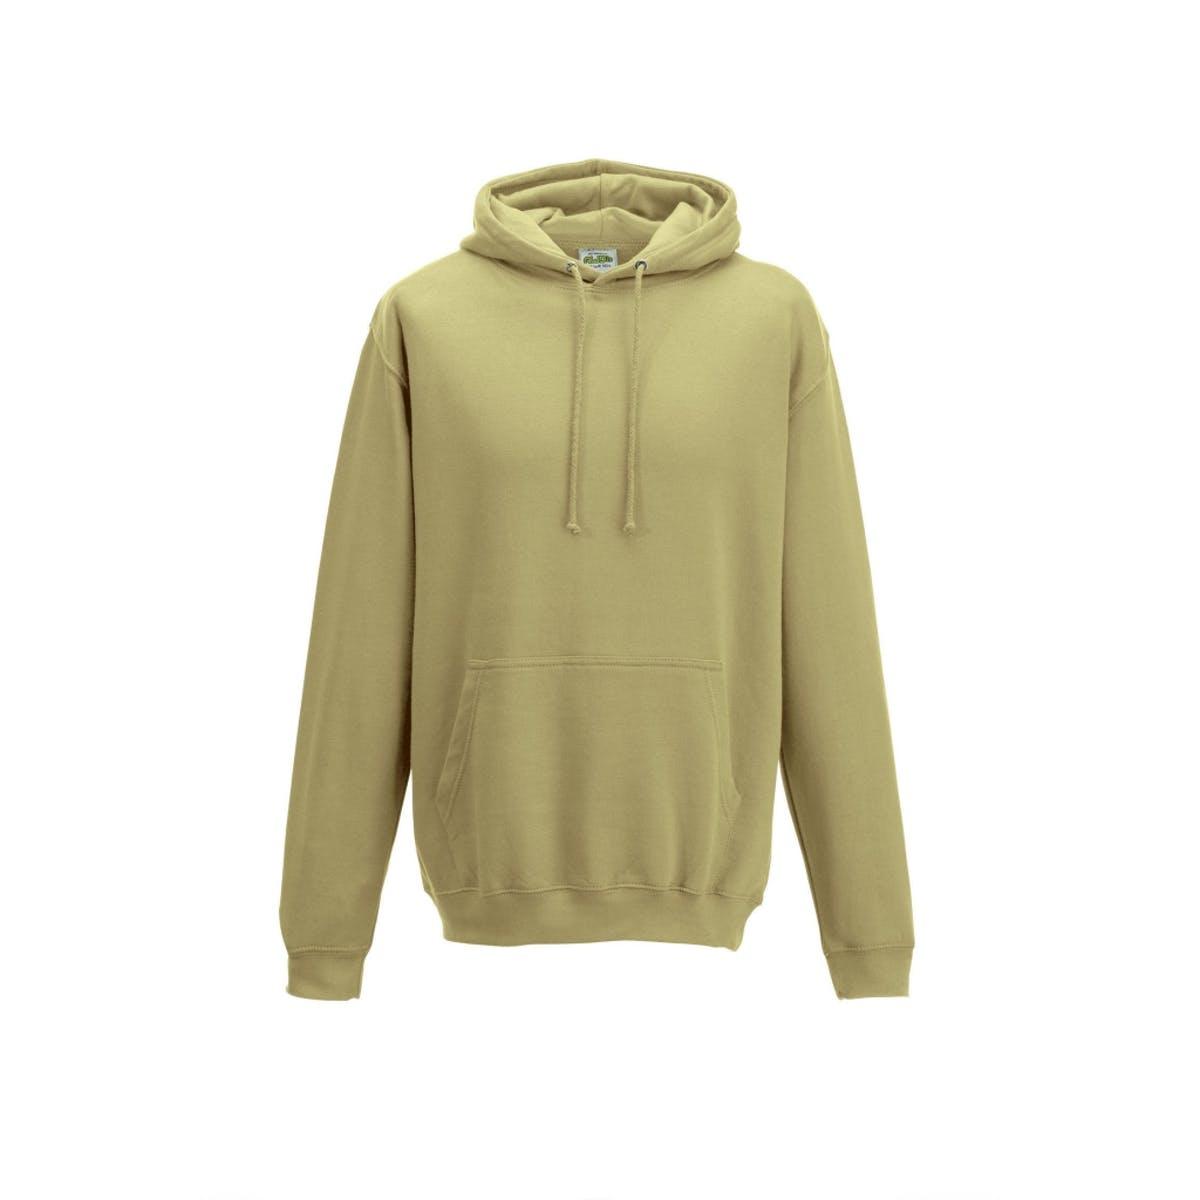 desert sand college hoodies